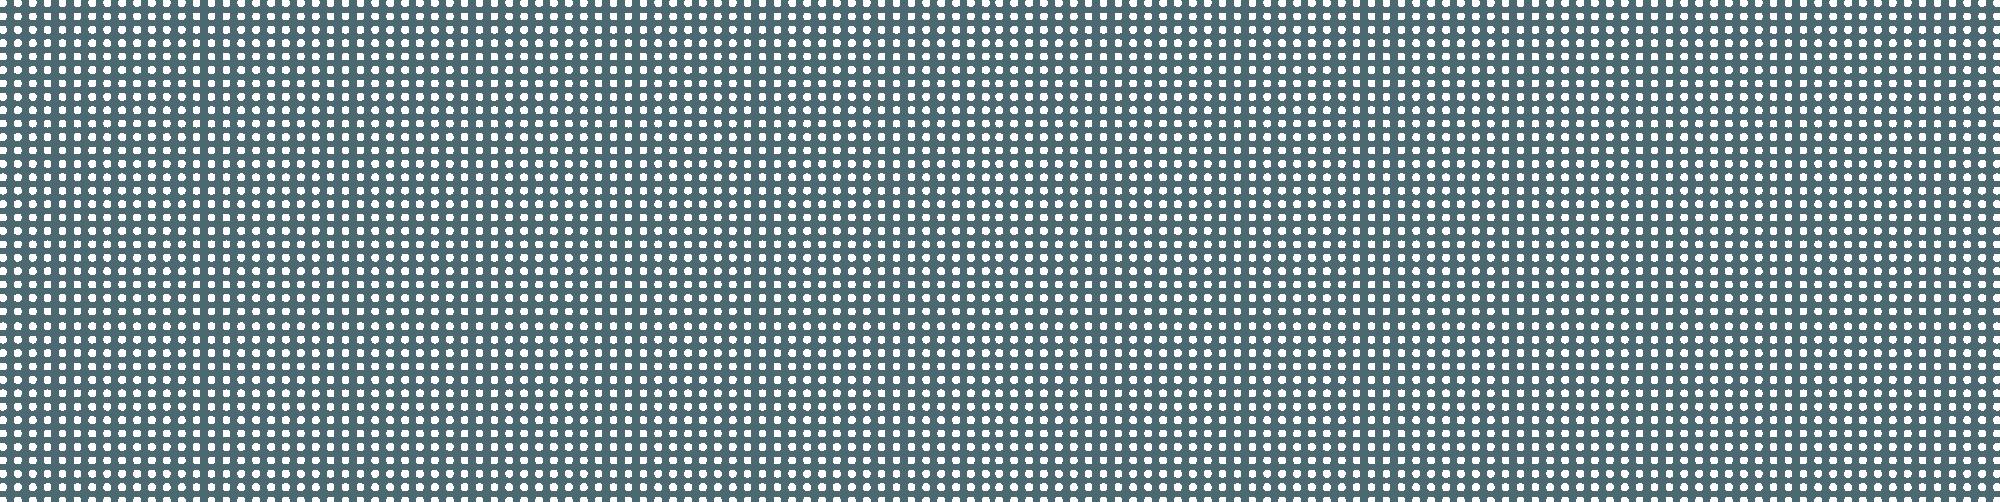 dots-overlay@1x